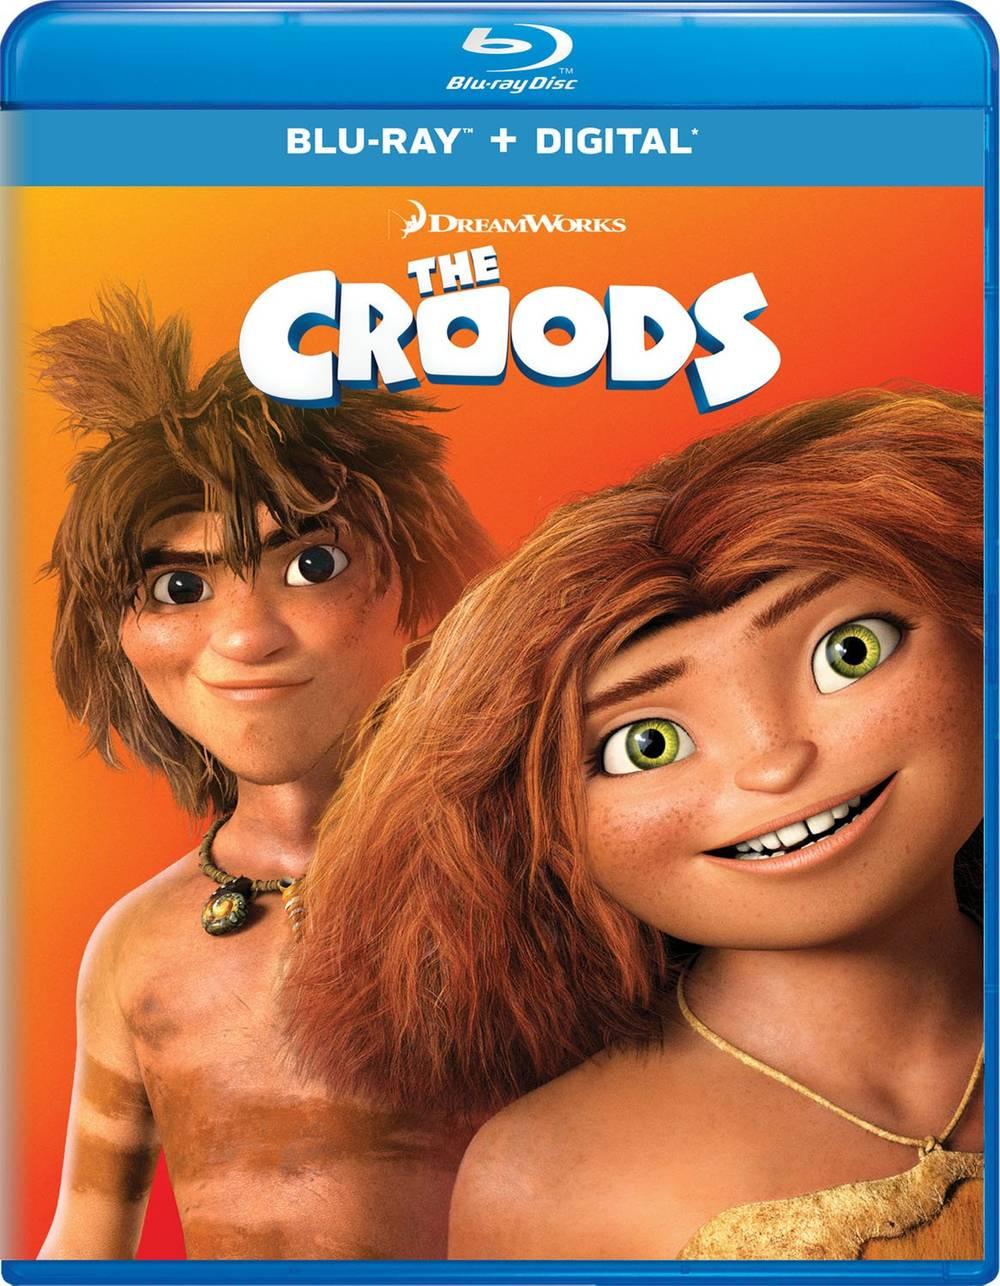 The Croods [Movie] - The Croods